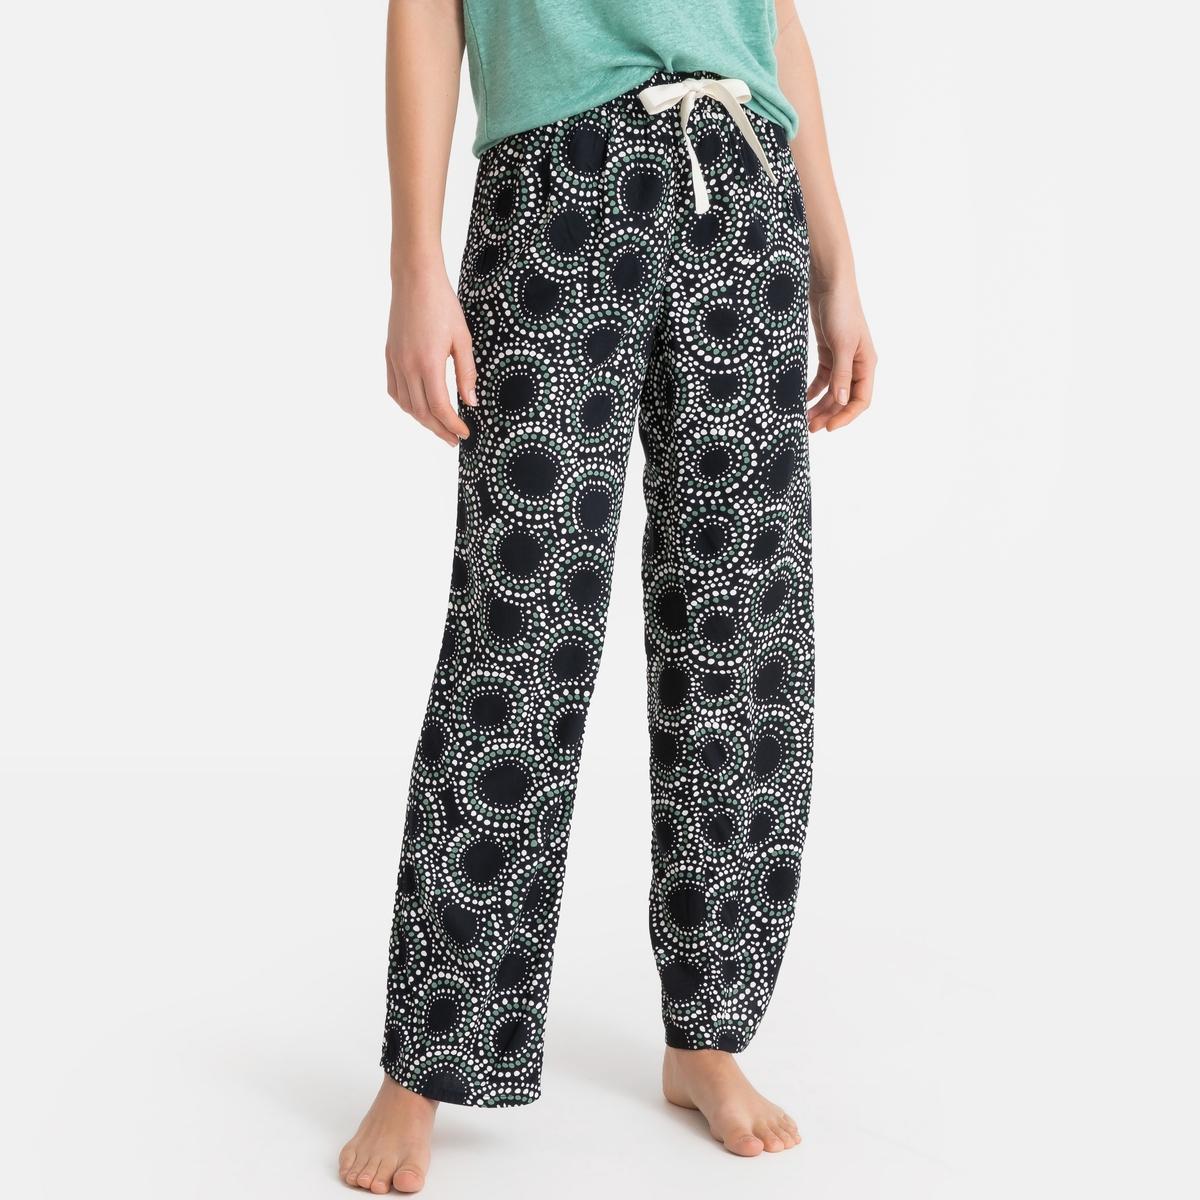 Pantalón de pijama estampado